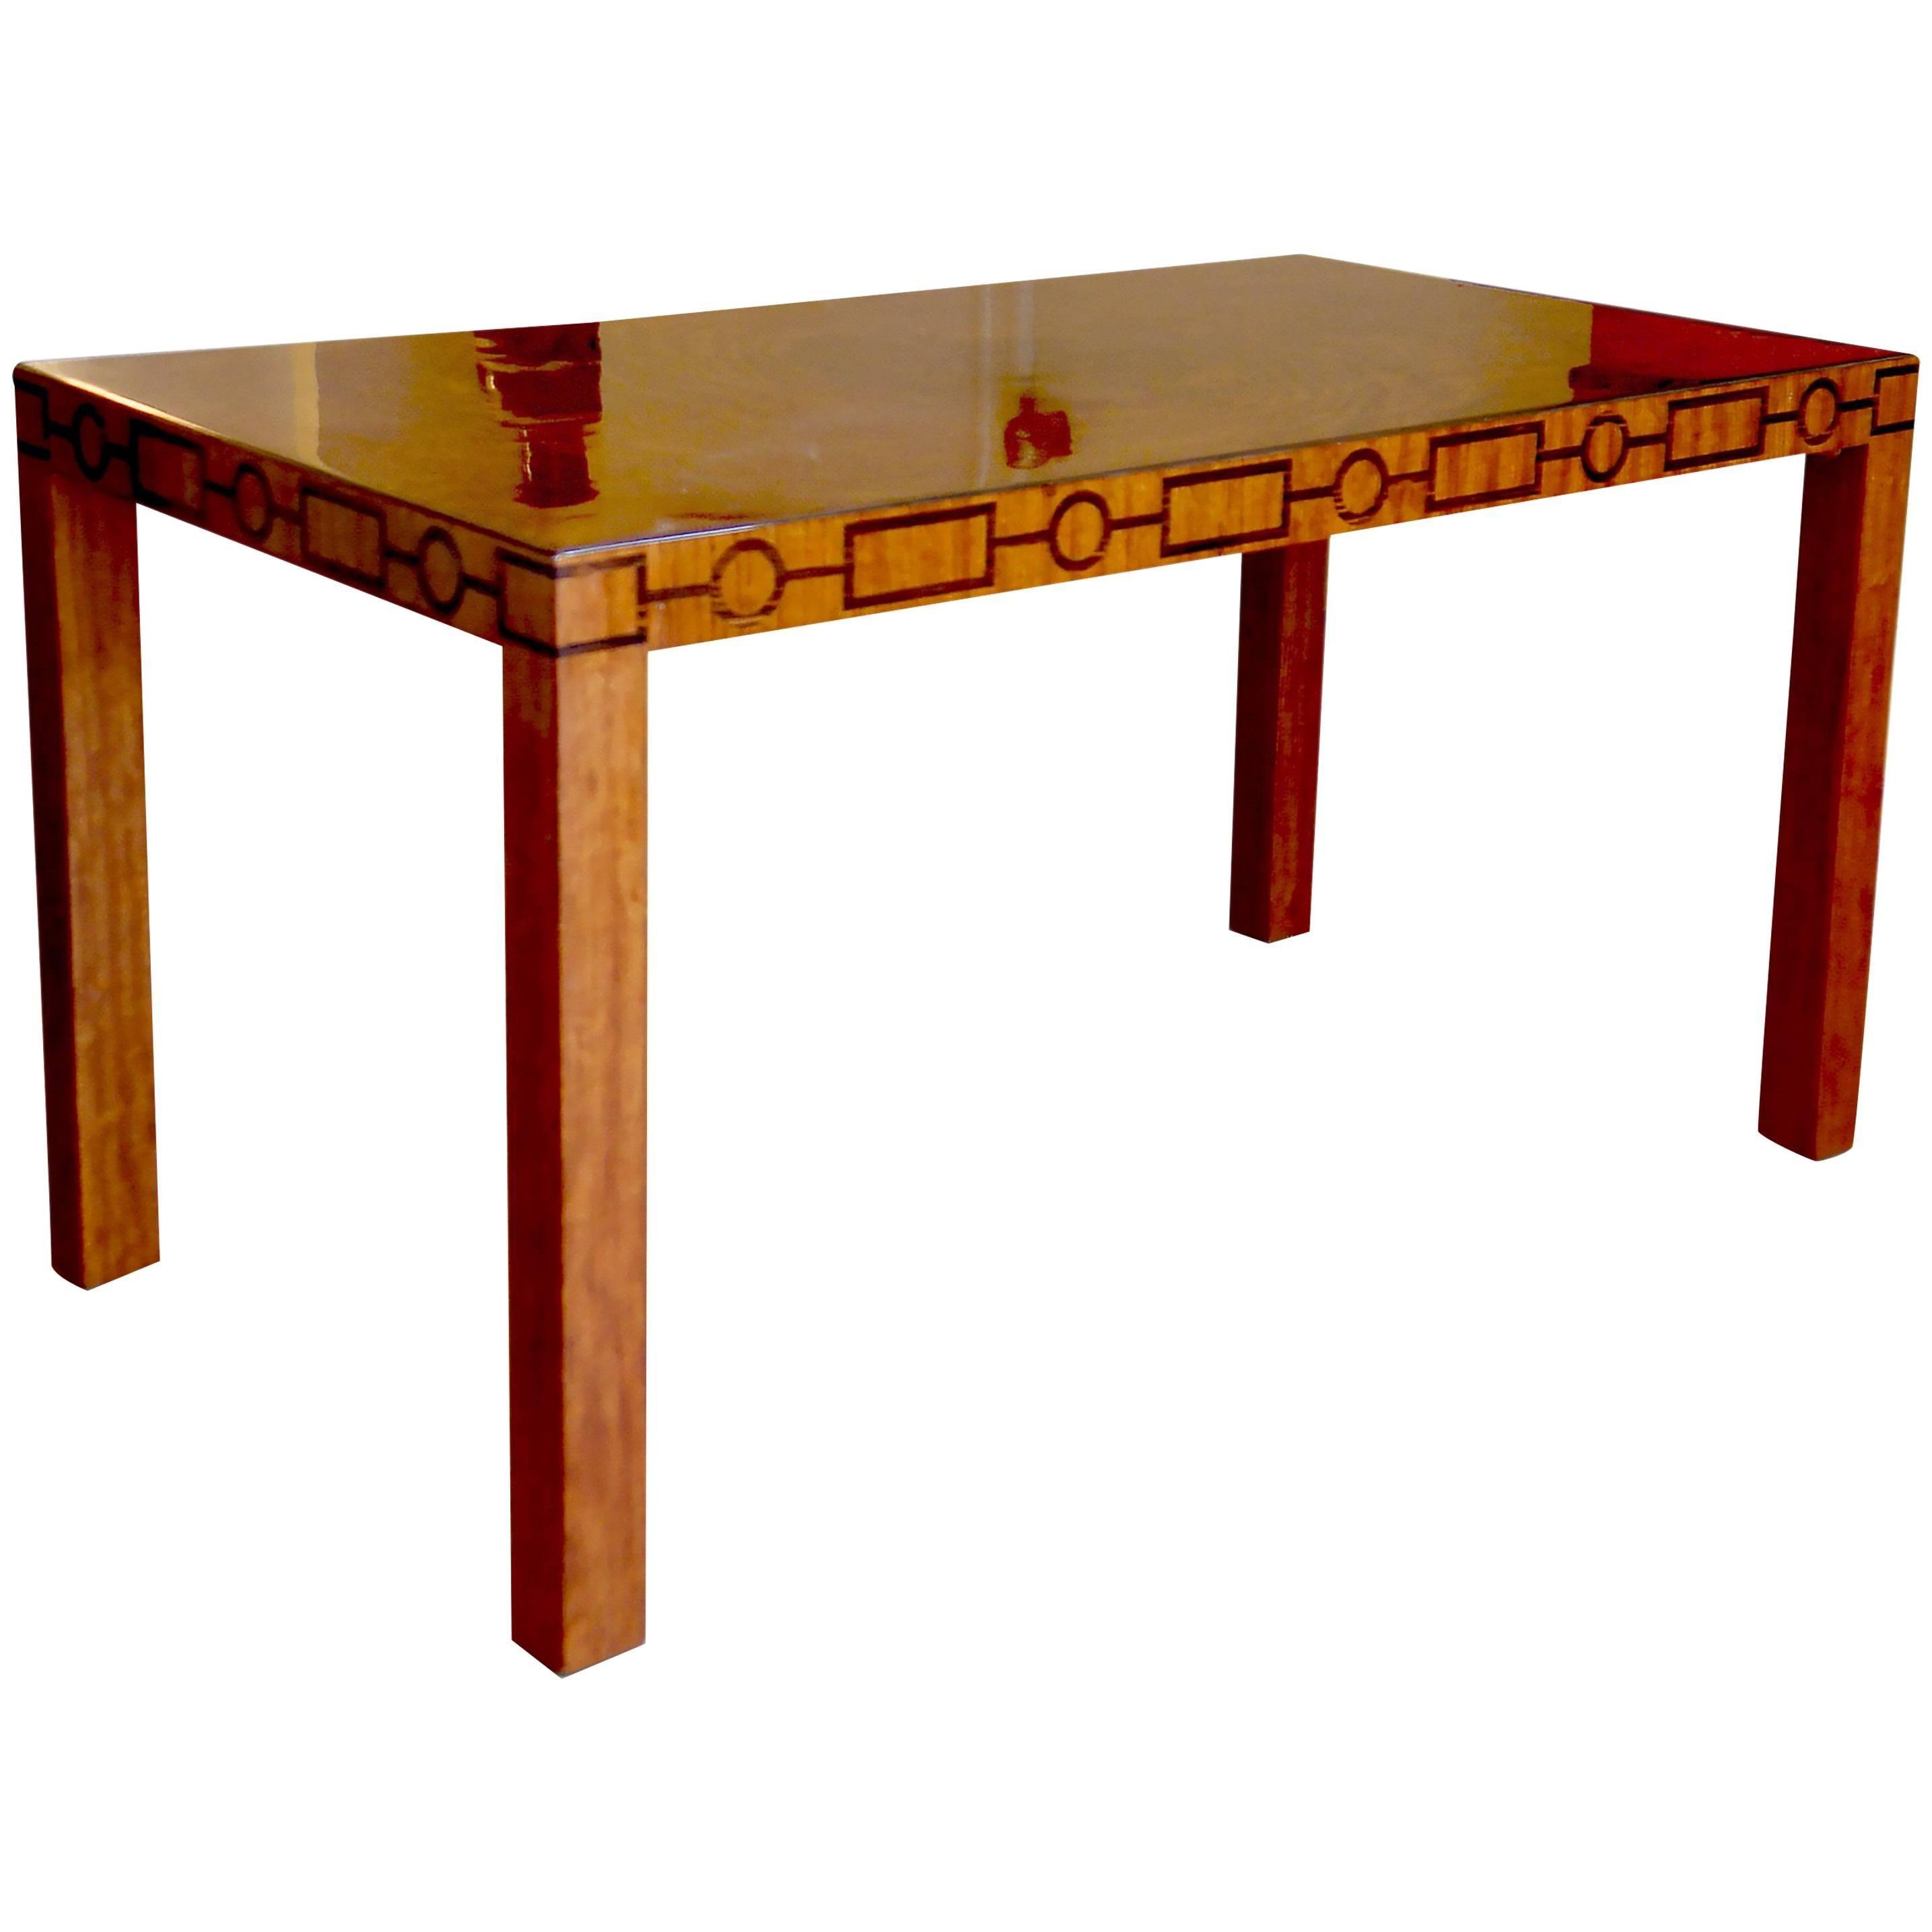 Very Fine Swedish Modern Classicism Coffee Table With Geometric Inlay  Frieze 1